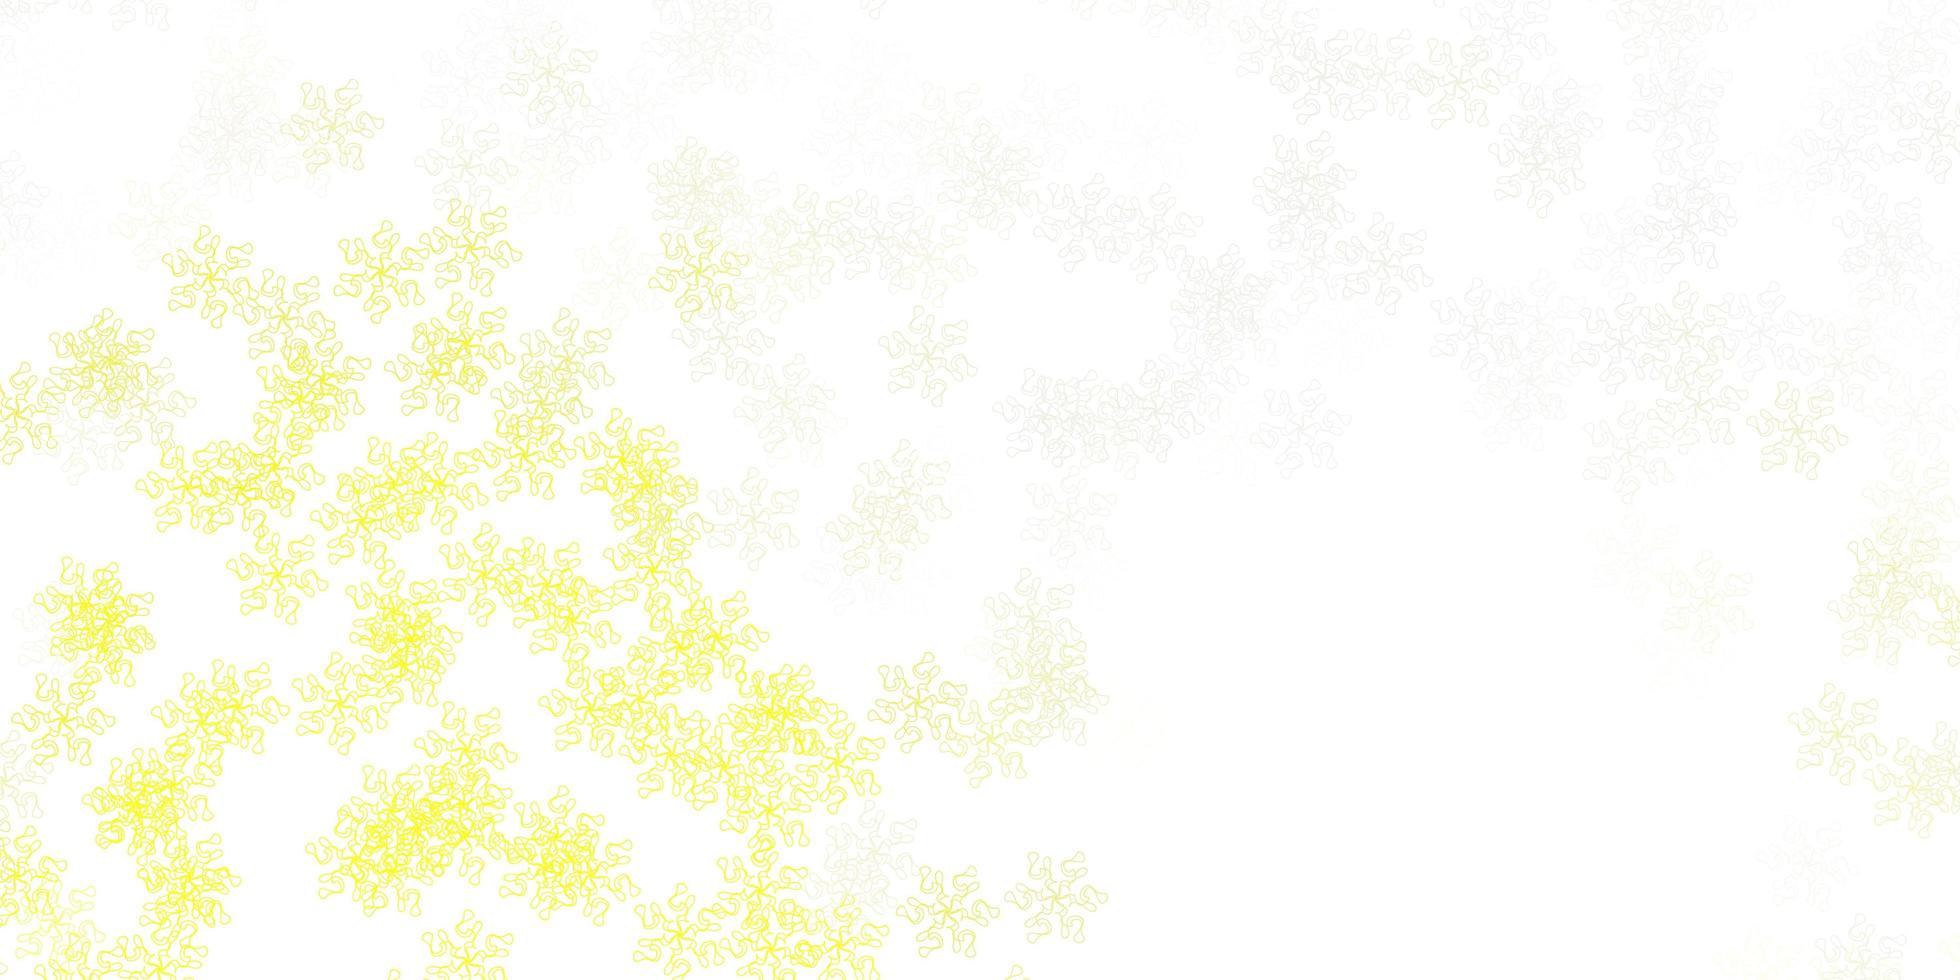 ljusgul bakgrund med blommor. vektor